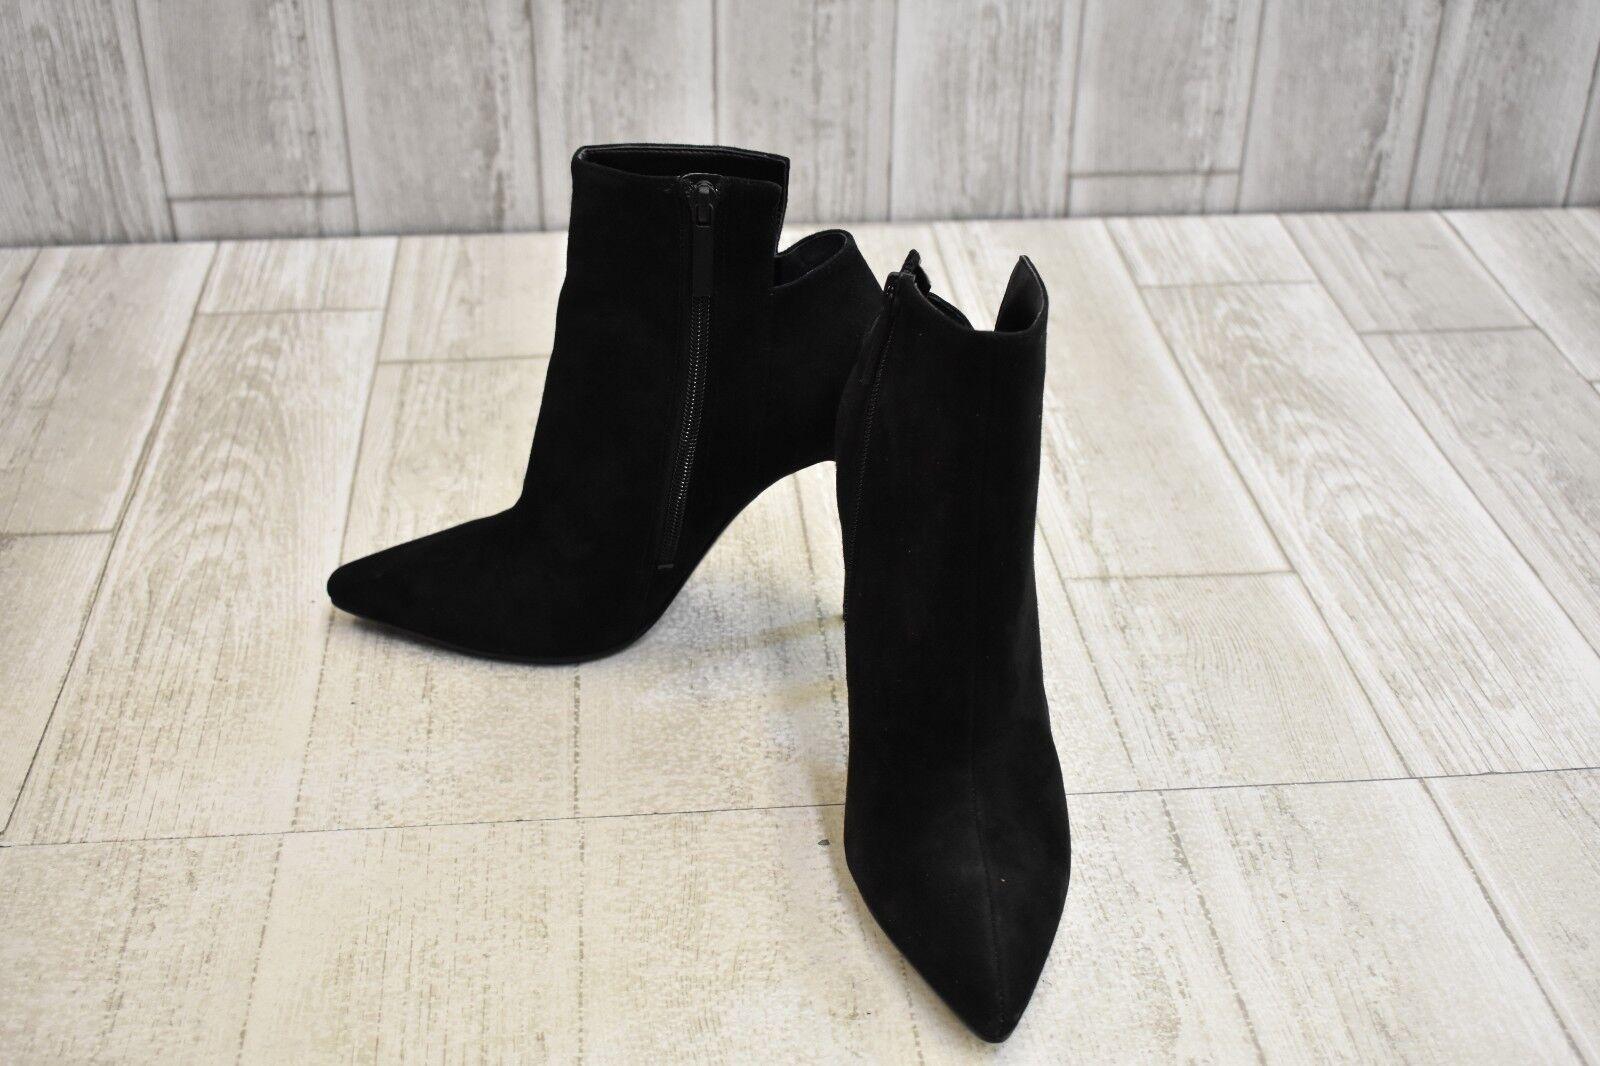 economico KENDALL + KYLIE Ariana Pointed Pointed Pointed Toe avvioies - Donna  Dimensione 7.5M - nero NEW   fino al 42% di sconto